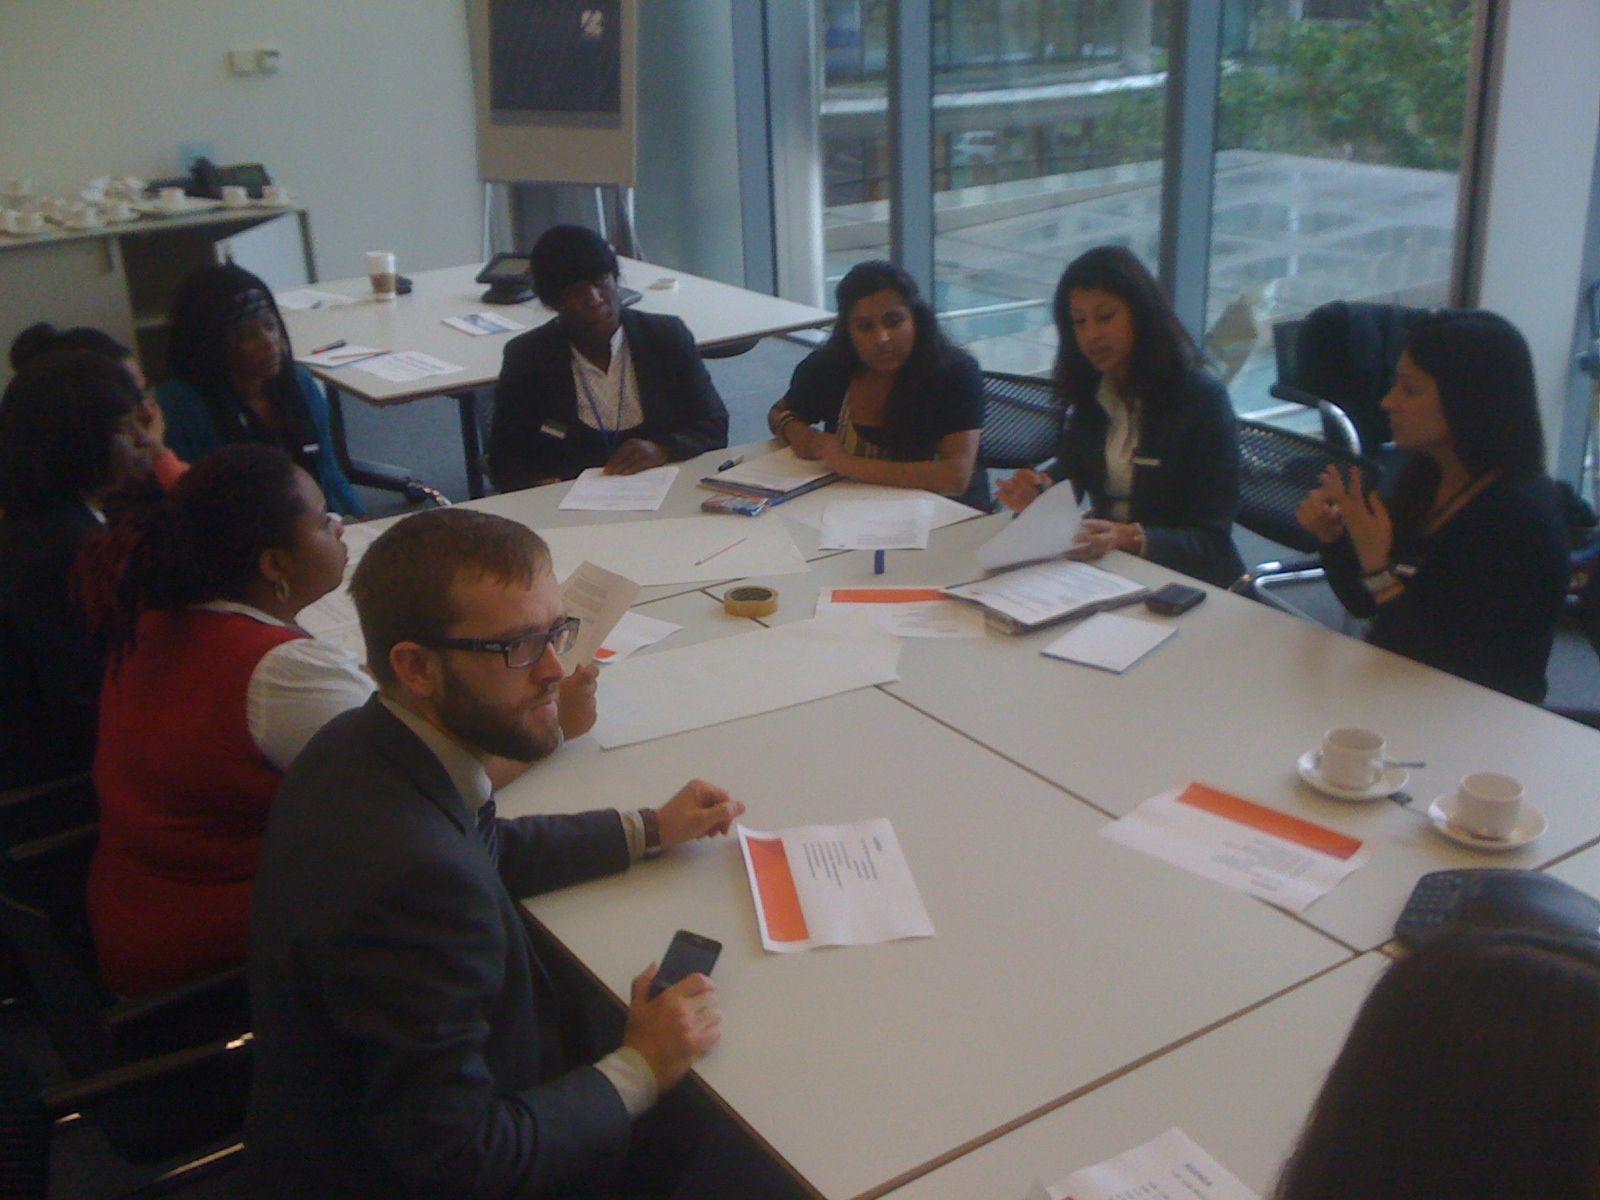 Job Preparation Training at Barclays Wealth, Canary Wharf